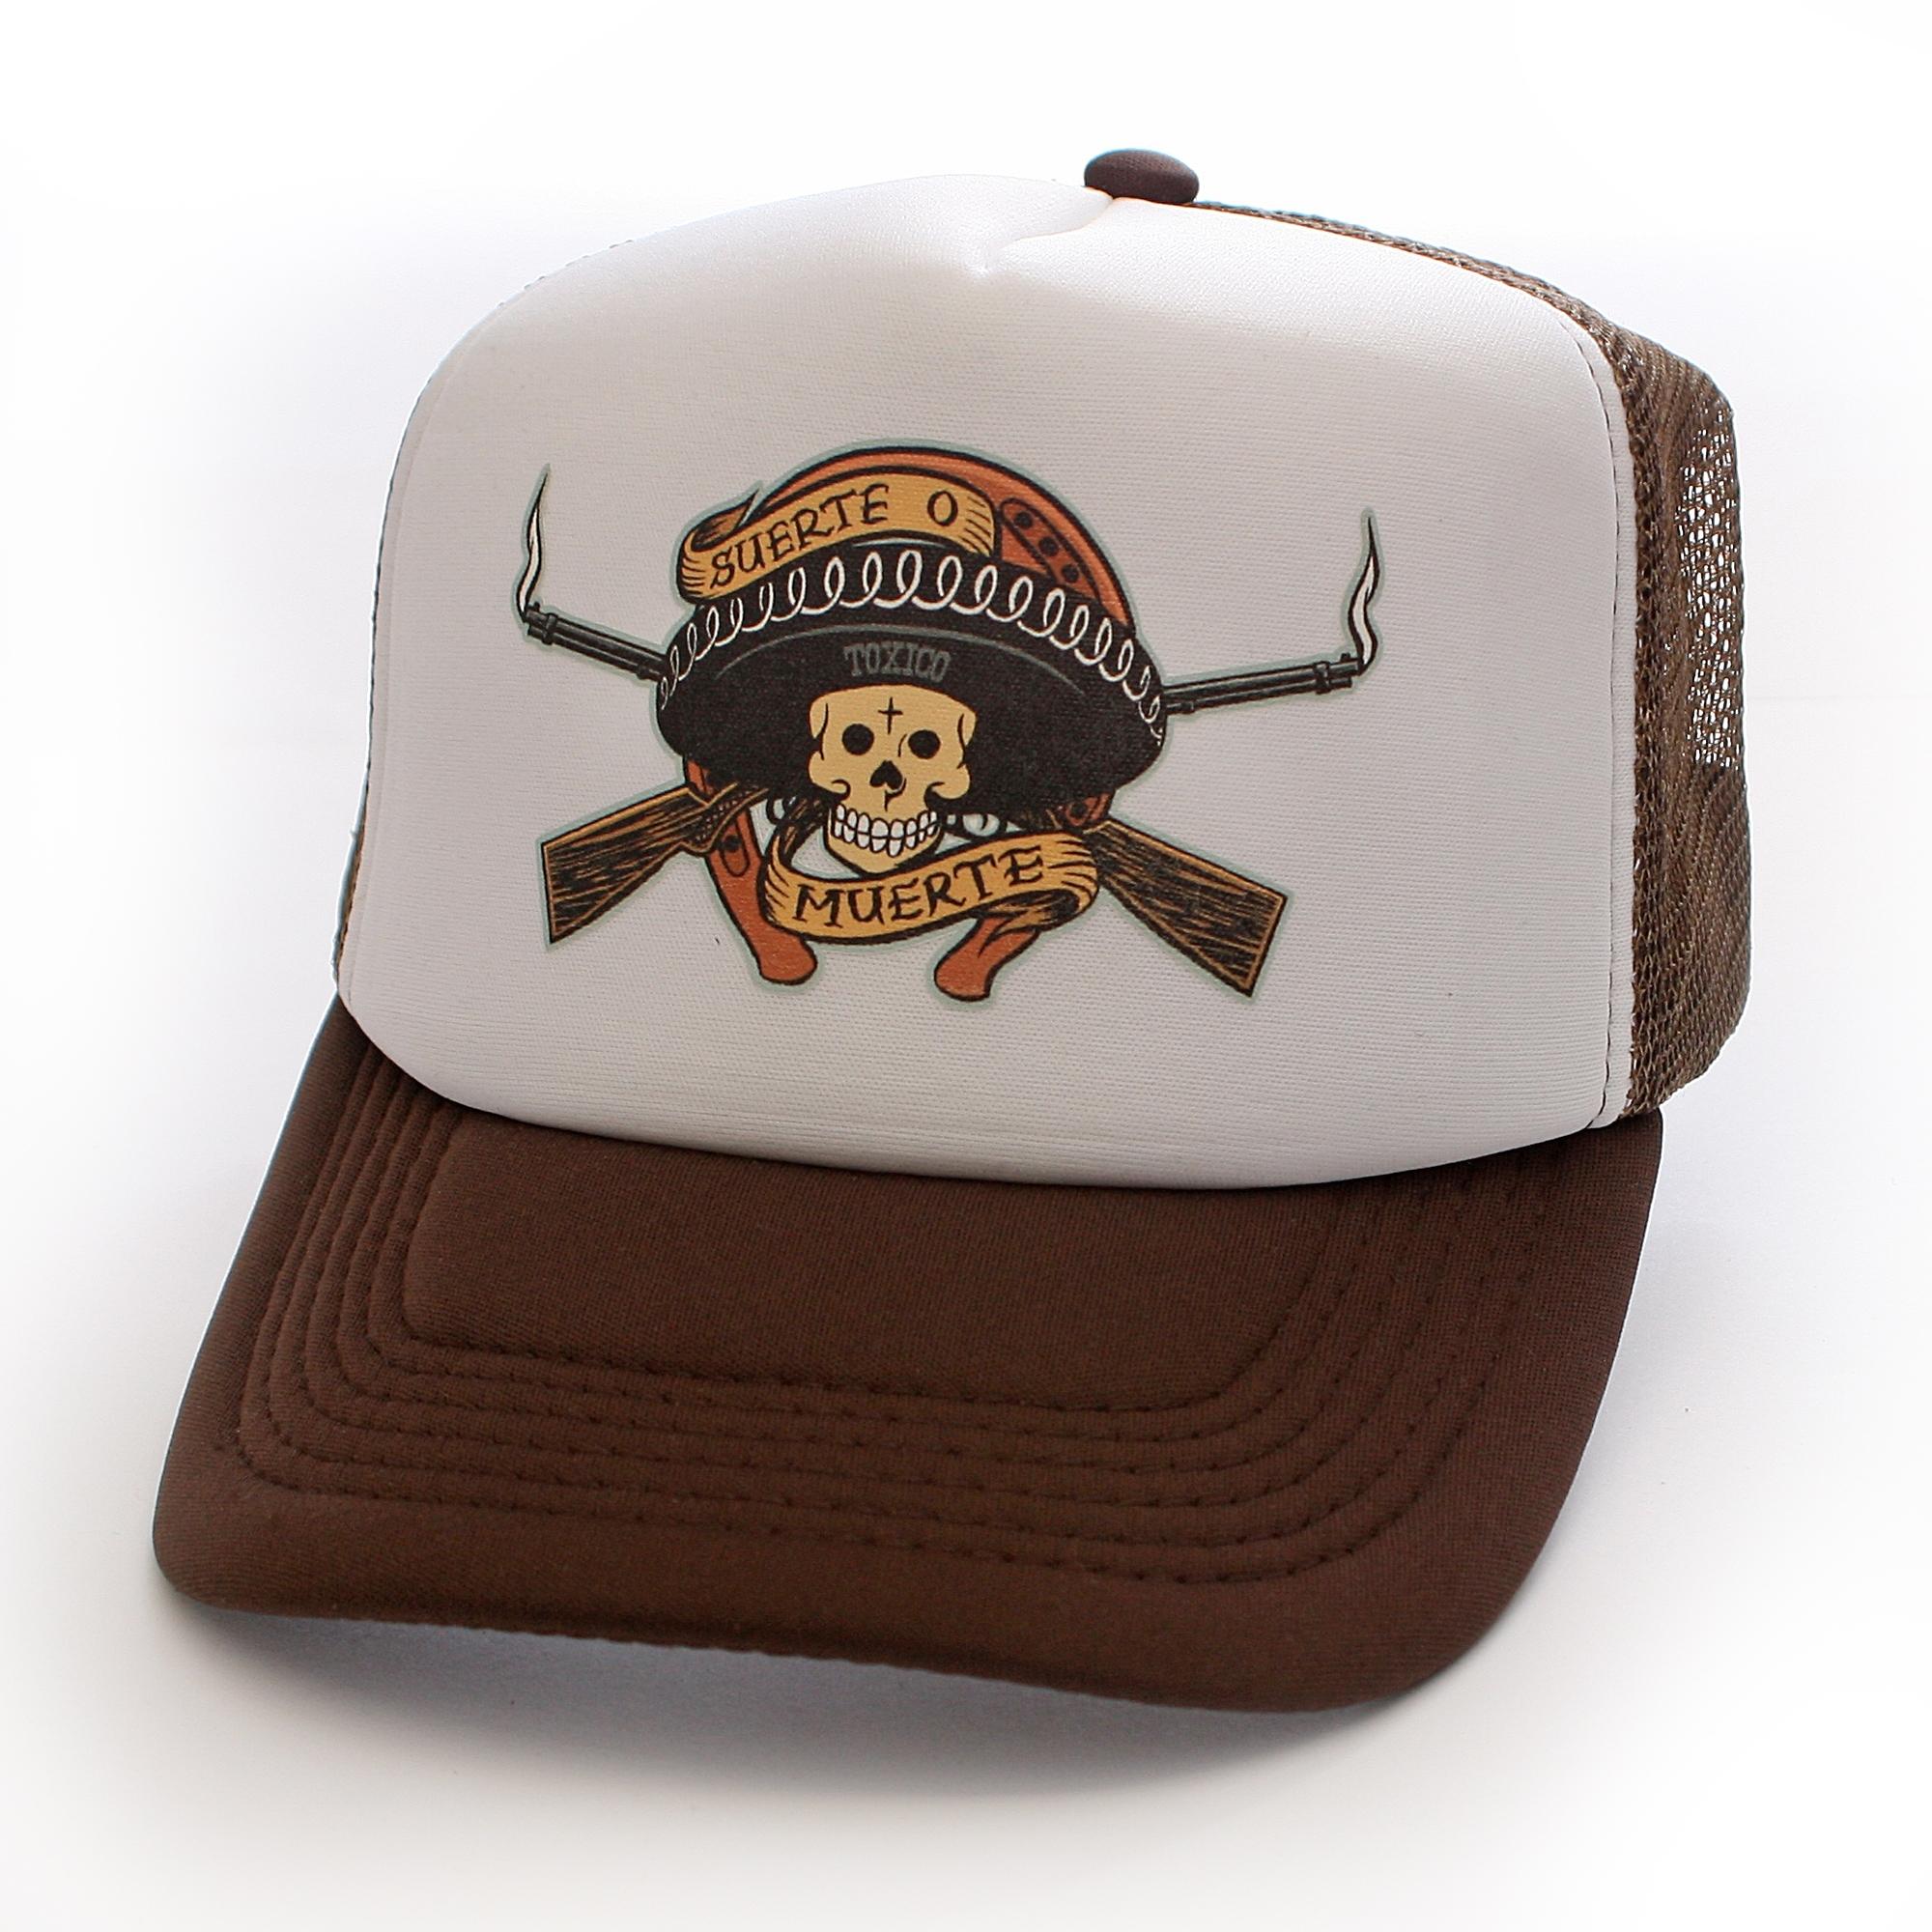 toxico_clothing_unisex_brown_muerte_bandit_trucker_hat_hats_and_caps_2.jpg